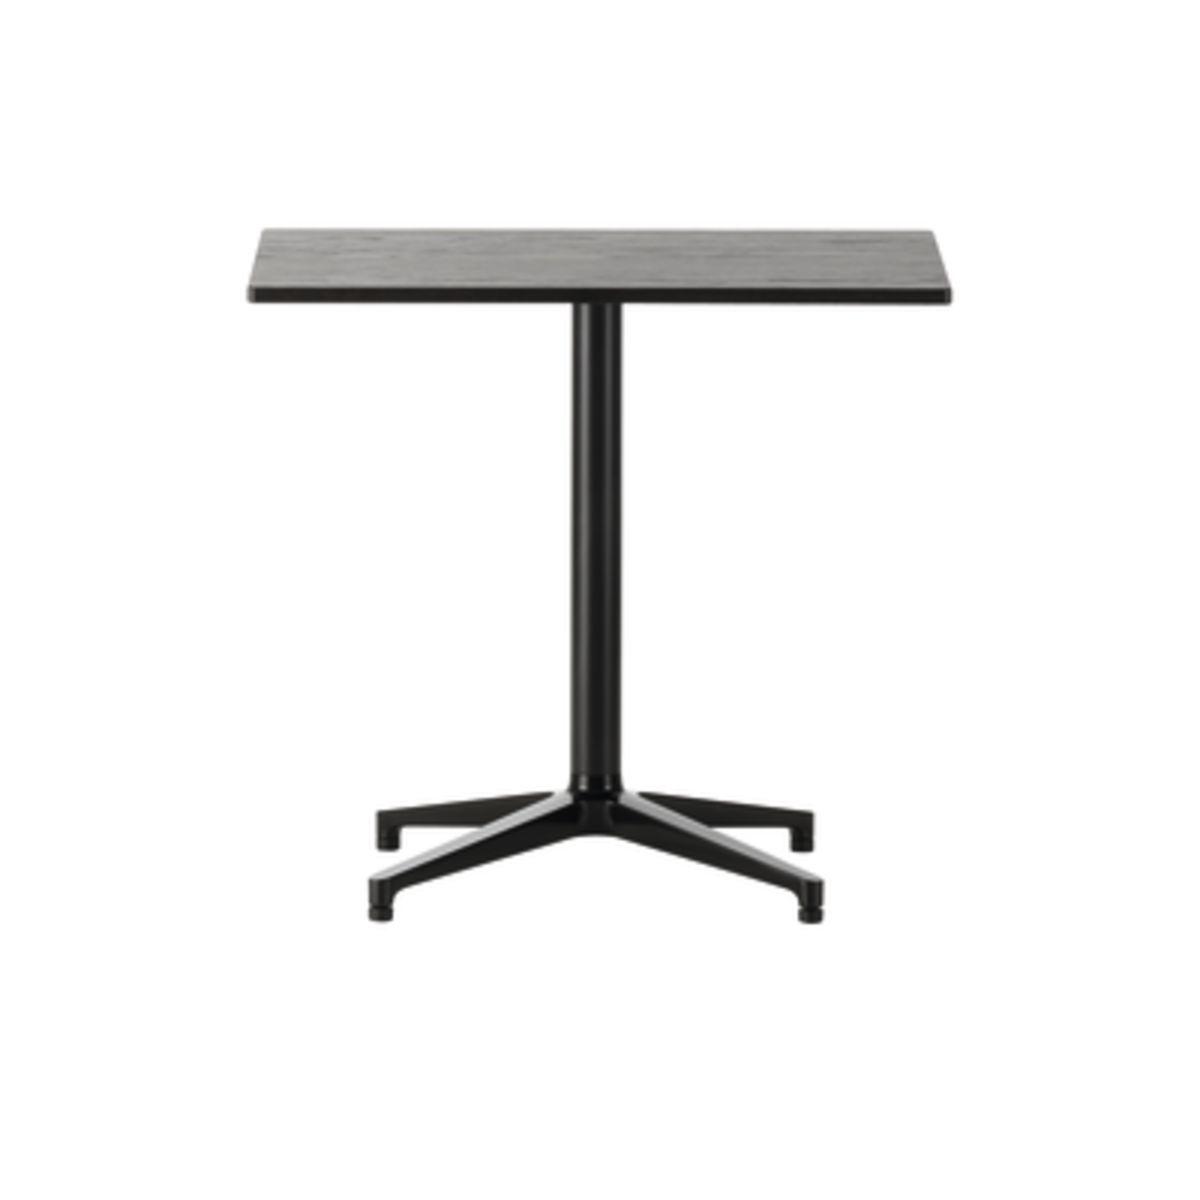 Cool Shop Bistro Round Outdoor Dining Table Machost Co Dining Chair Design Ideas Machostcouk